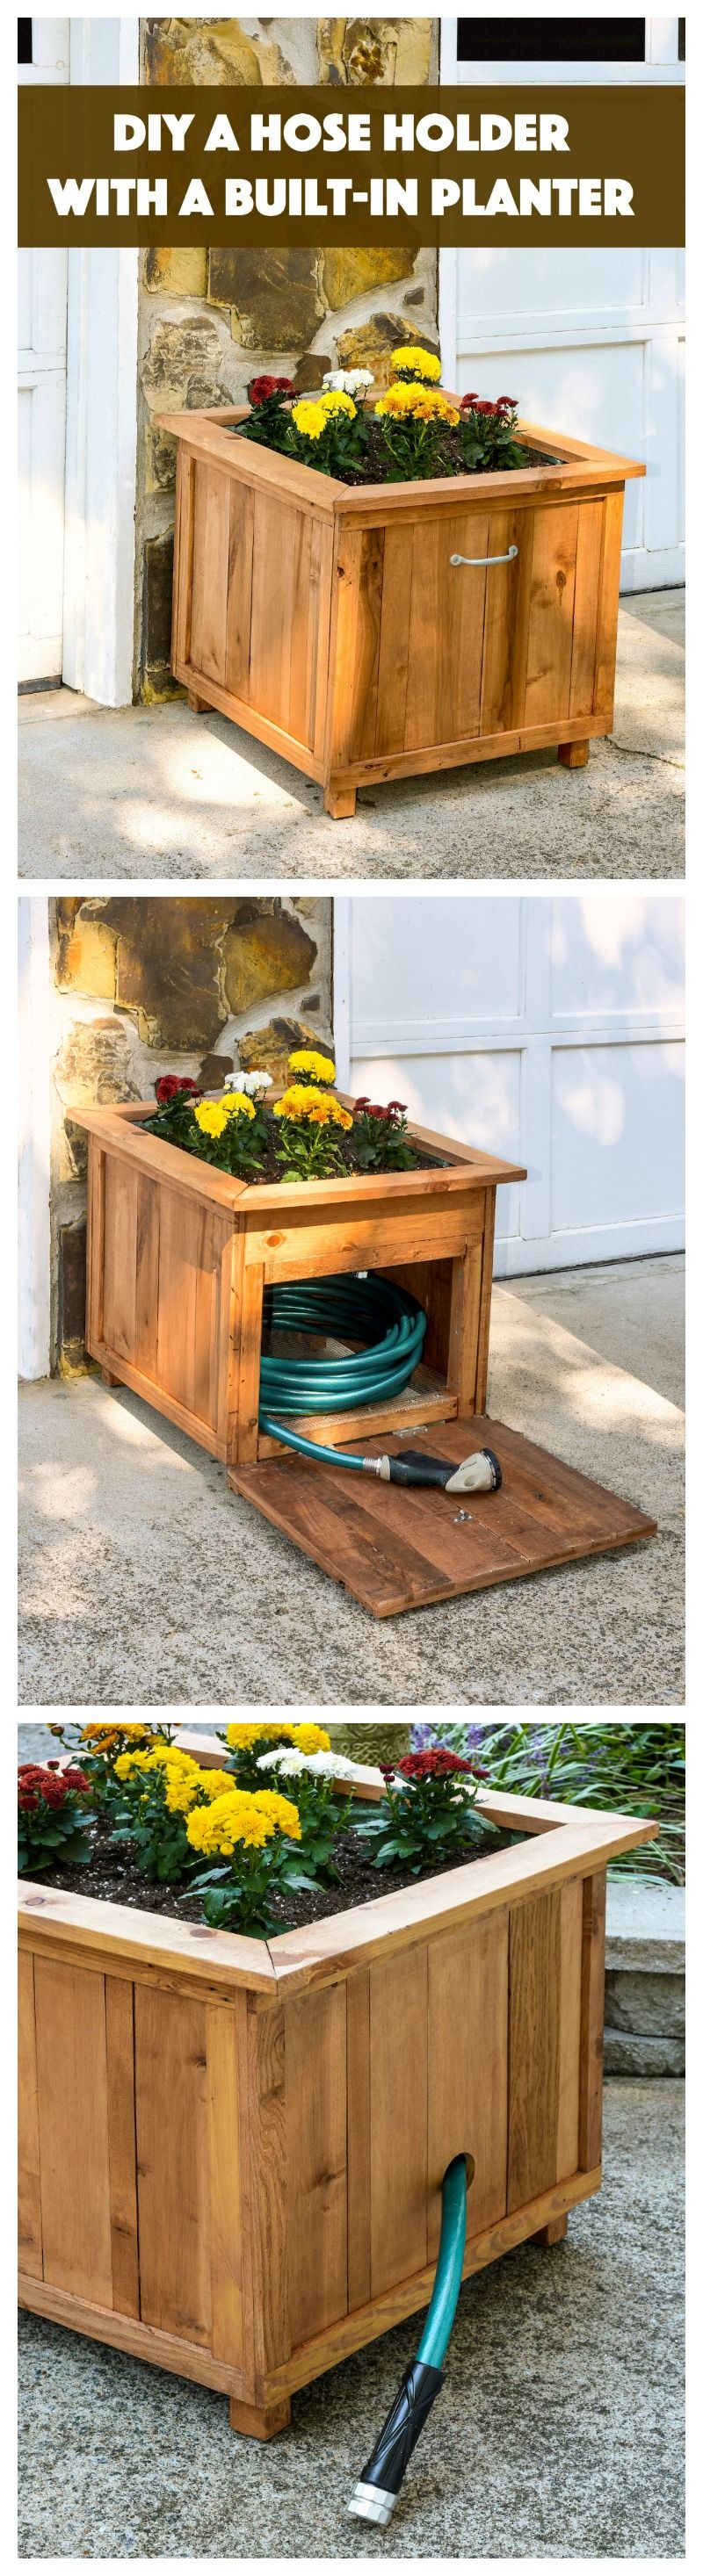 DIY Pallet Wood Hose Holder with Planter | My Favorite Pins ...